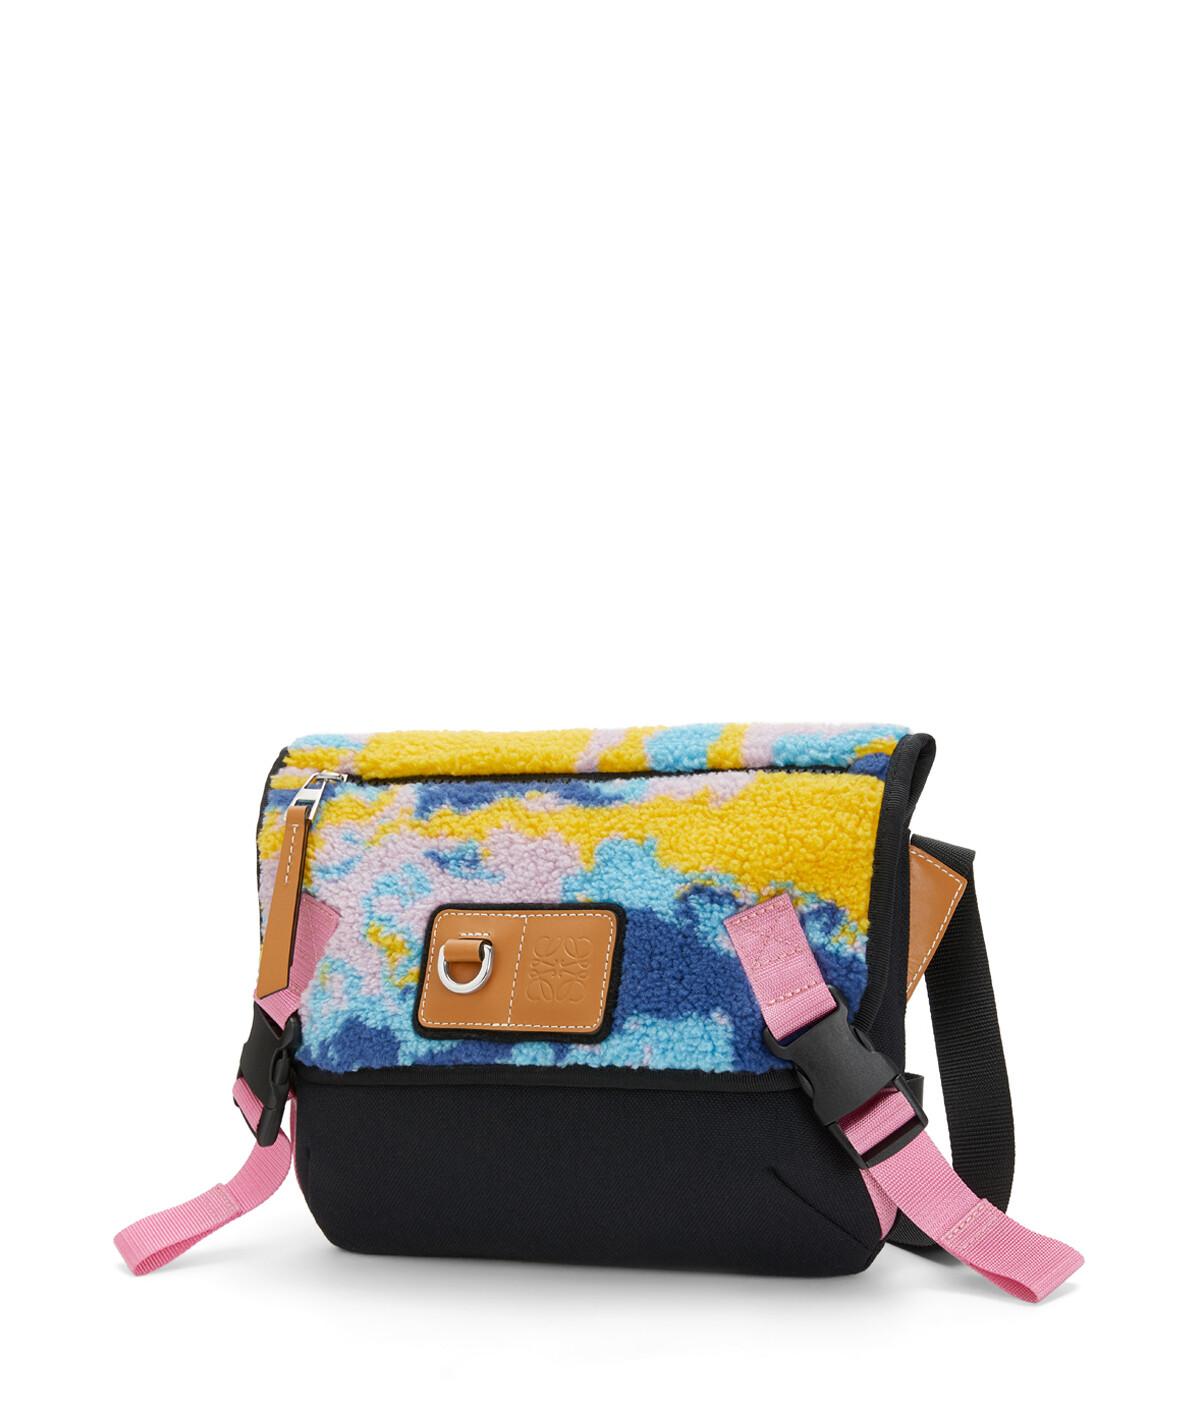 LOEWE Eye/Loewe/Nature Messenger Camouflage Small Bag Multicolor front